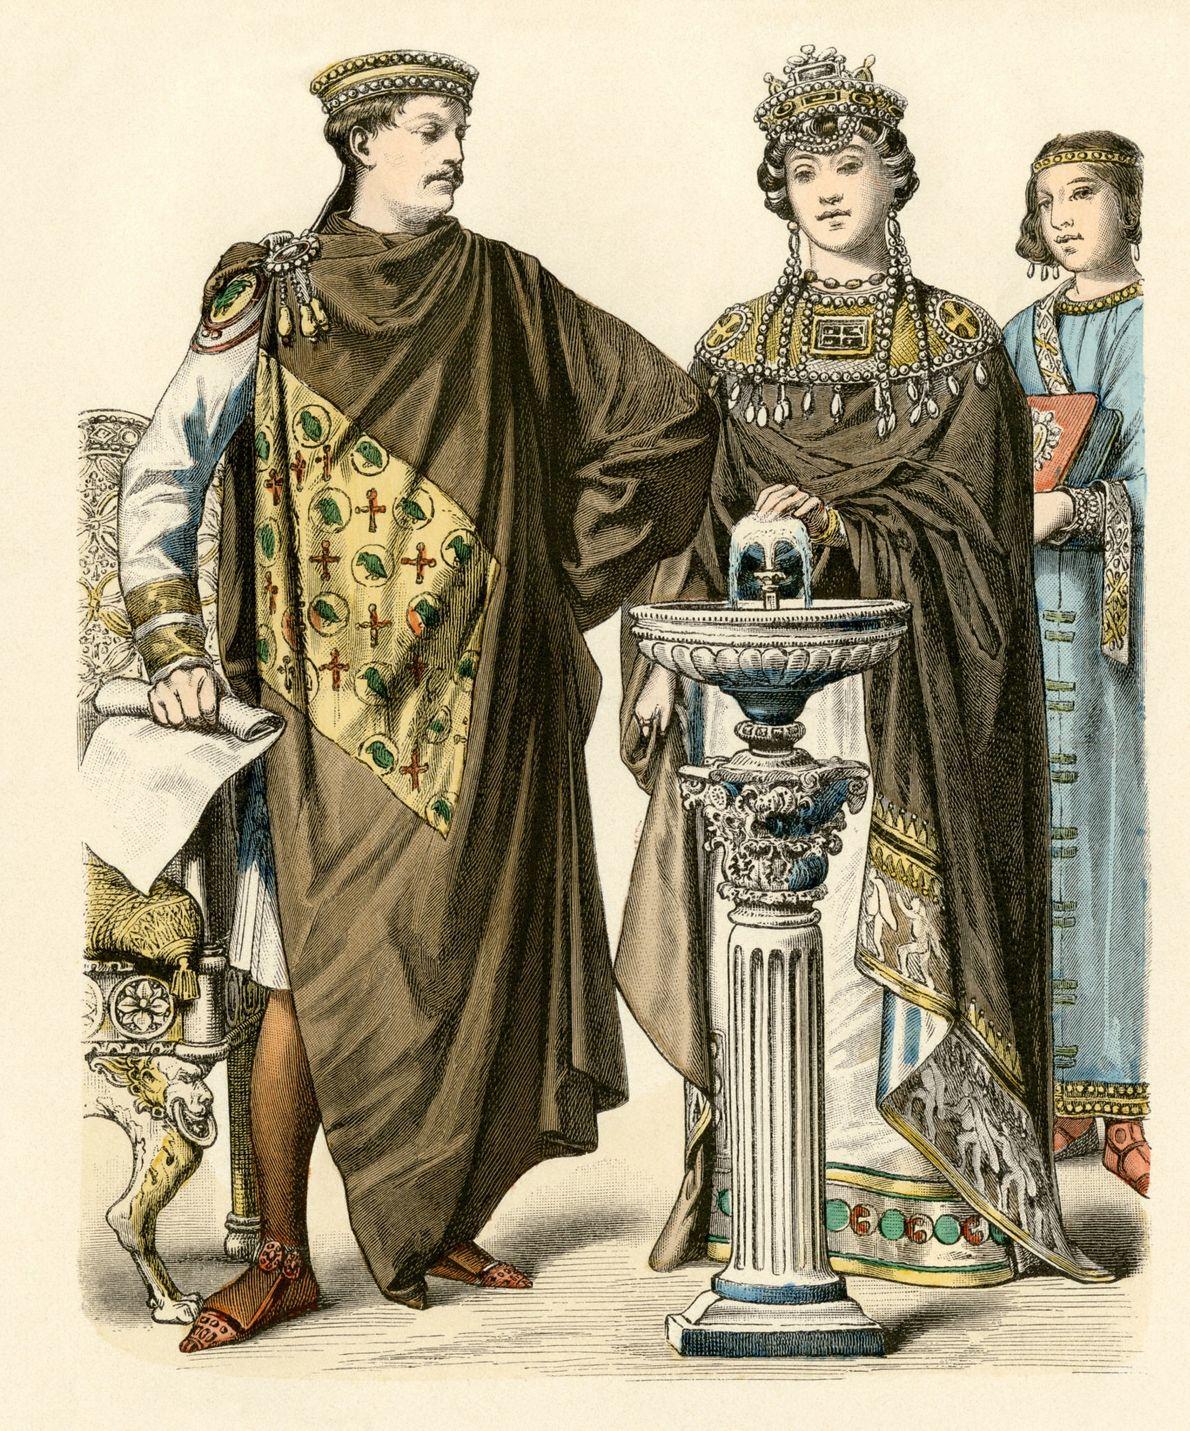 THEODORA UND JUSTIANIAN I.